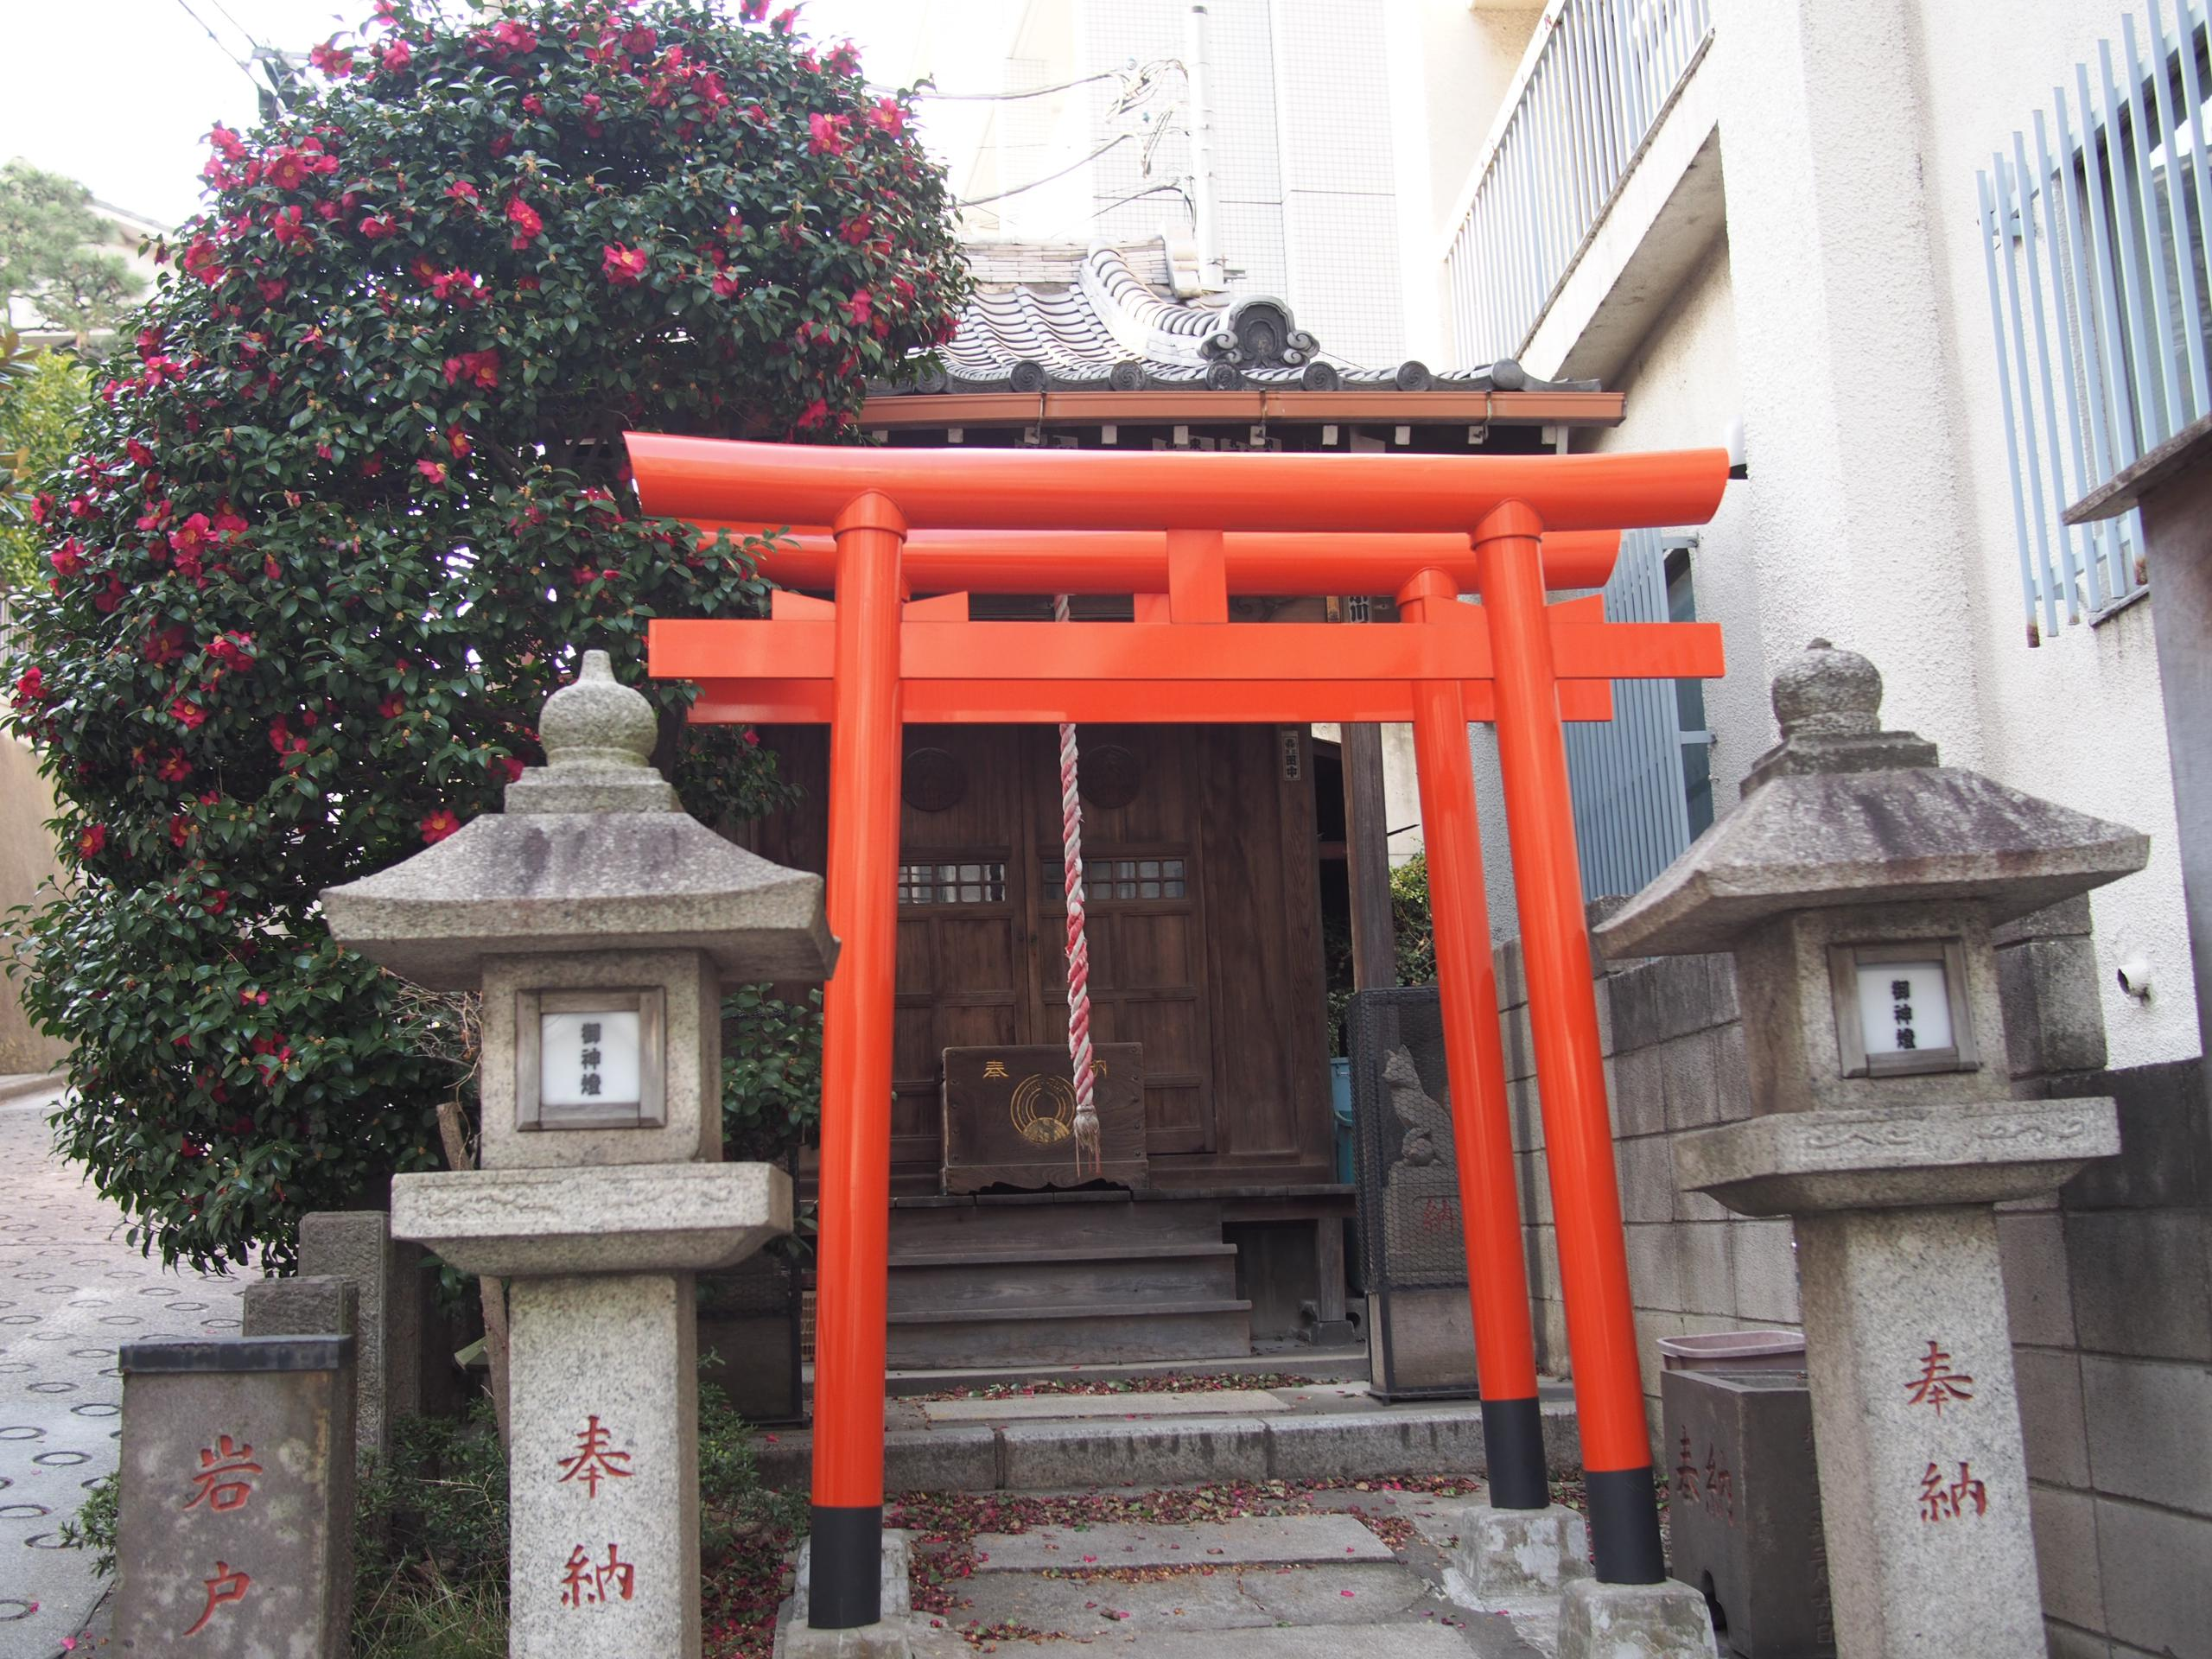 繁栄稲荷神社の鳥居